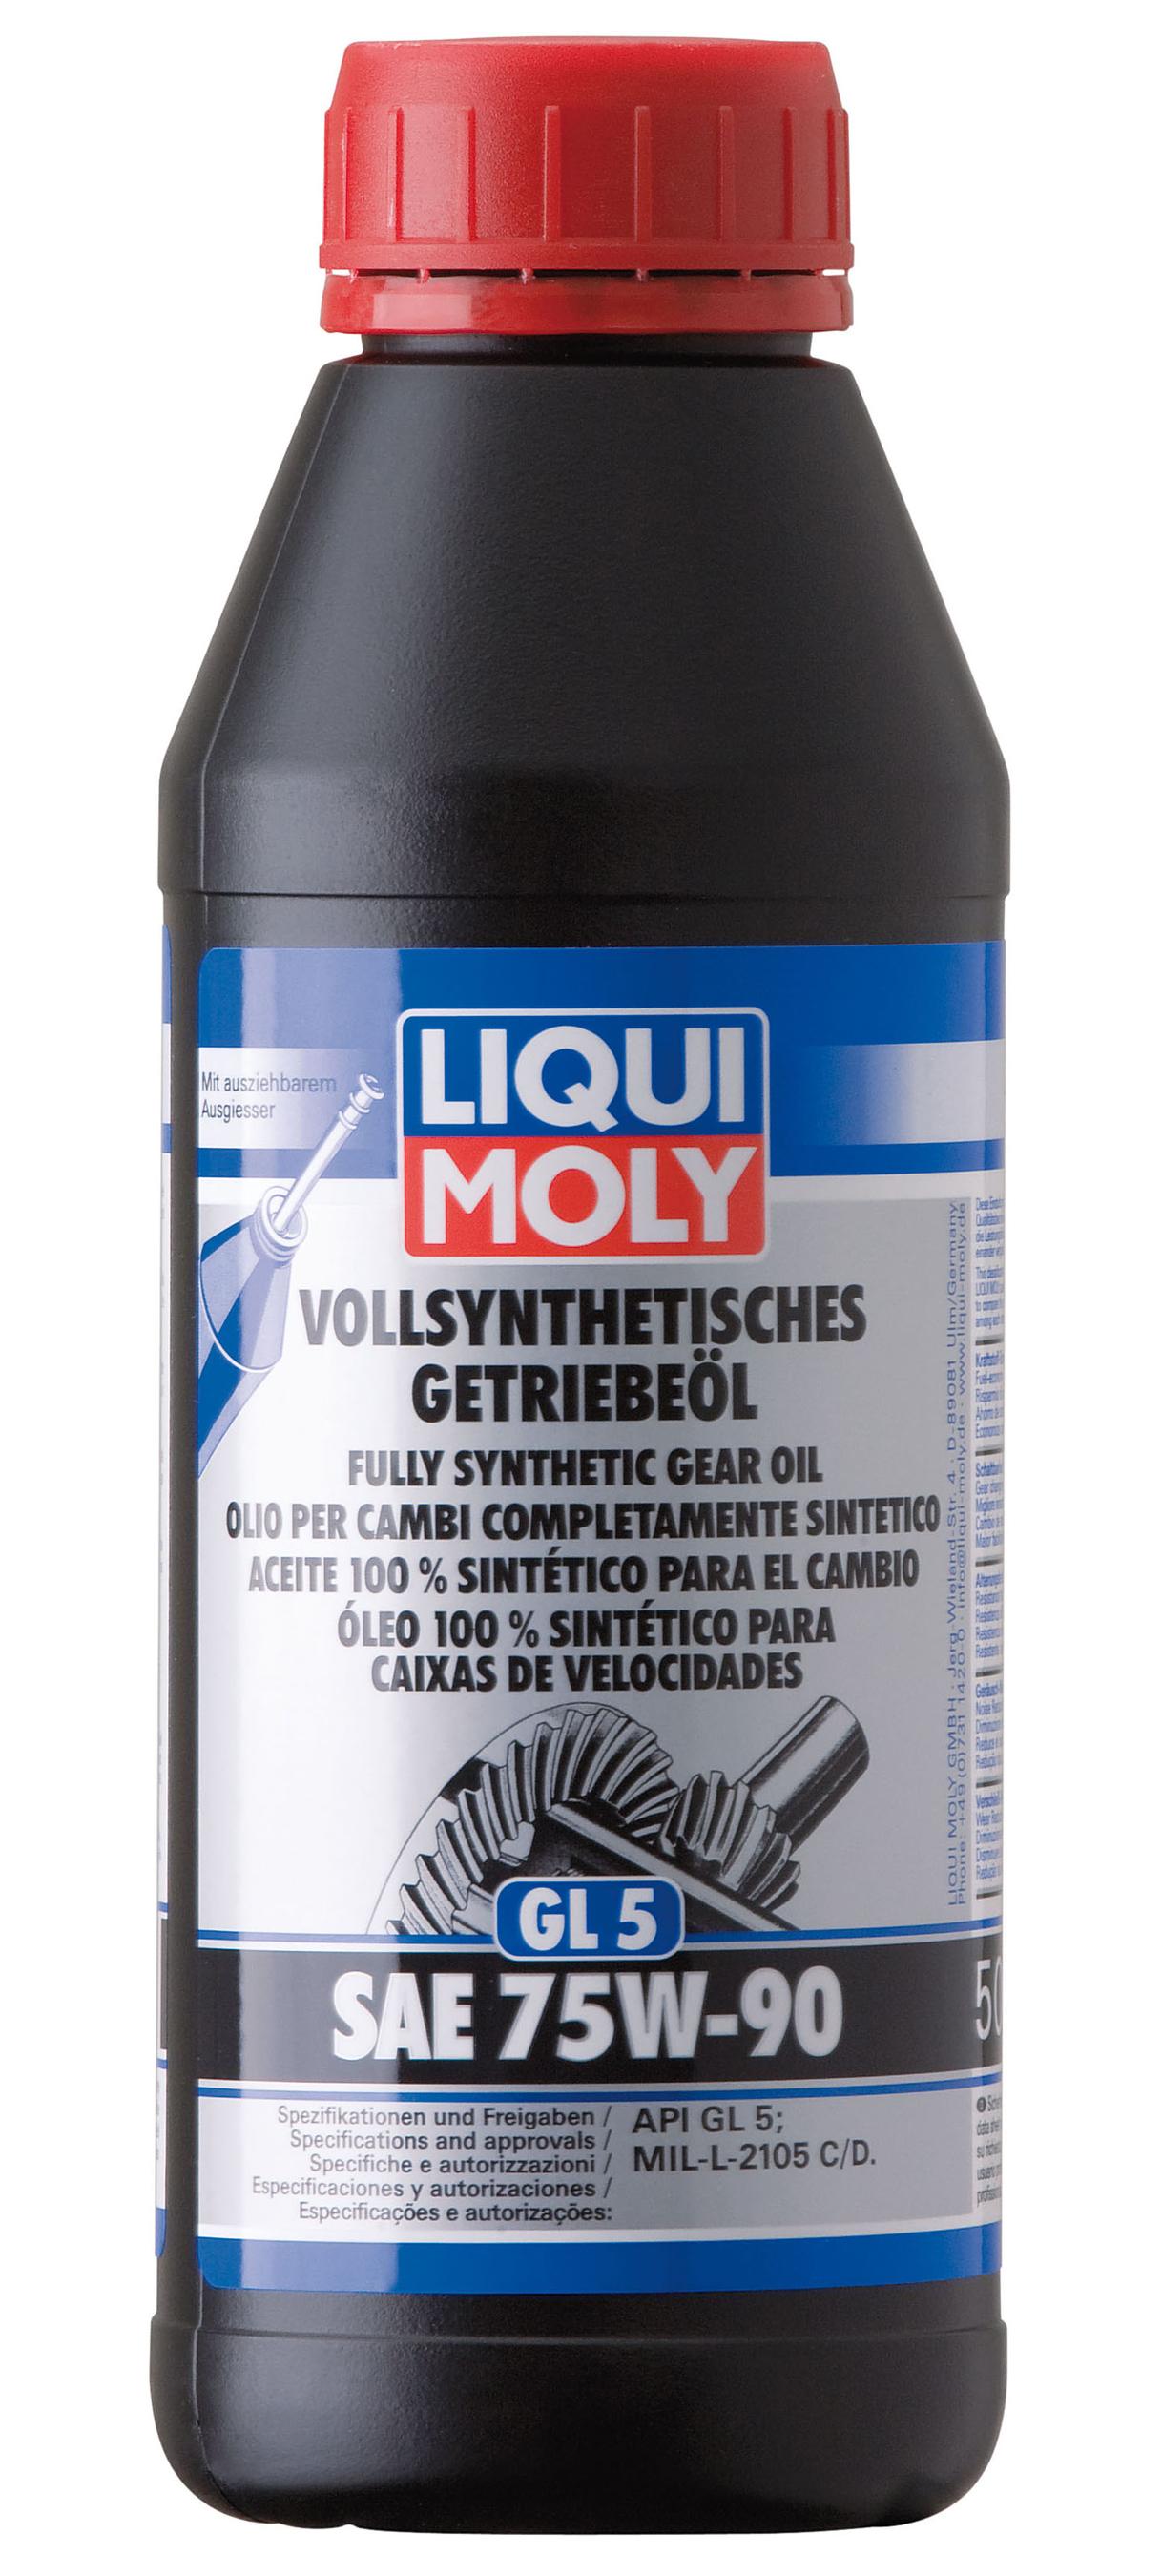 Liqui Moly Vollsynthetisches Getriebeöl (GL5) SAE 75W-90 500ml Bild 1